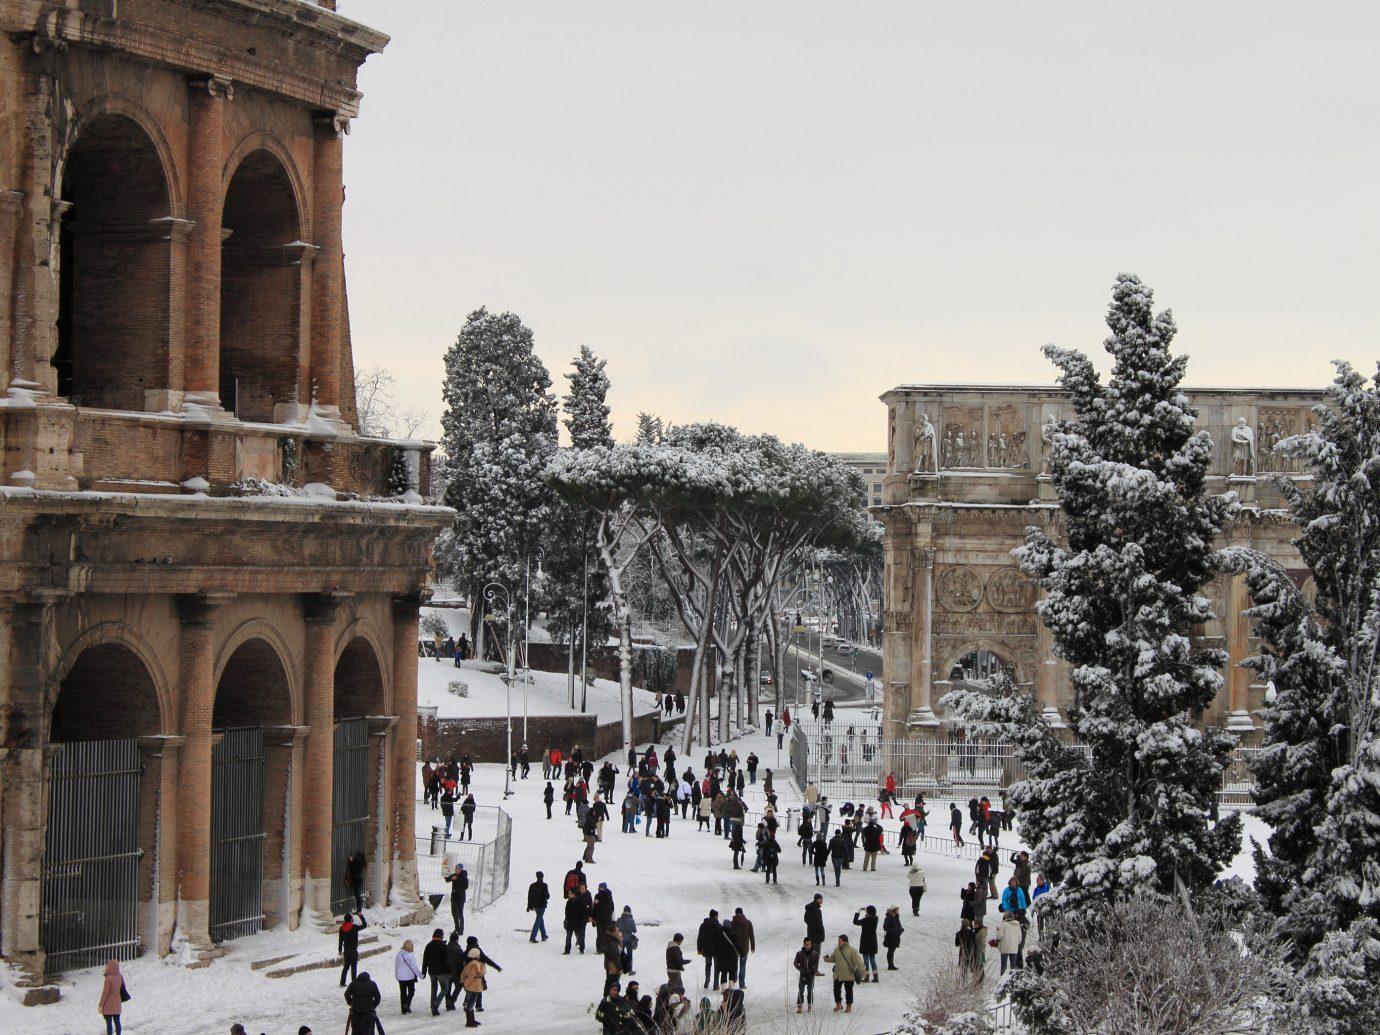 snowy street in rome, italy